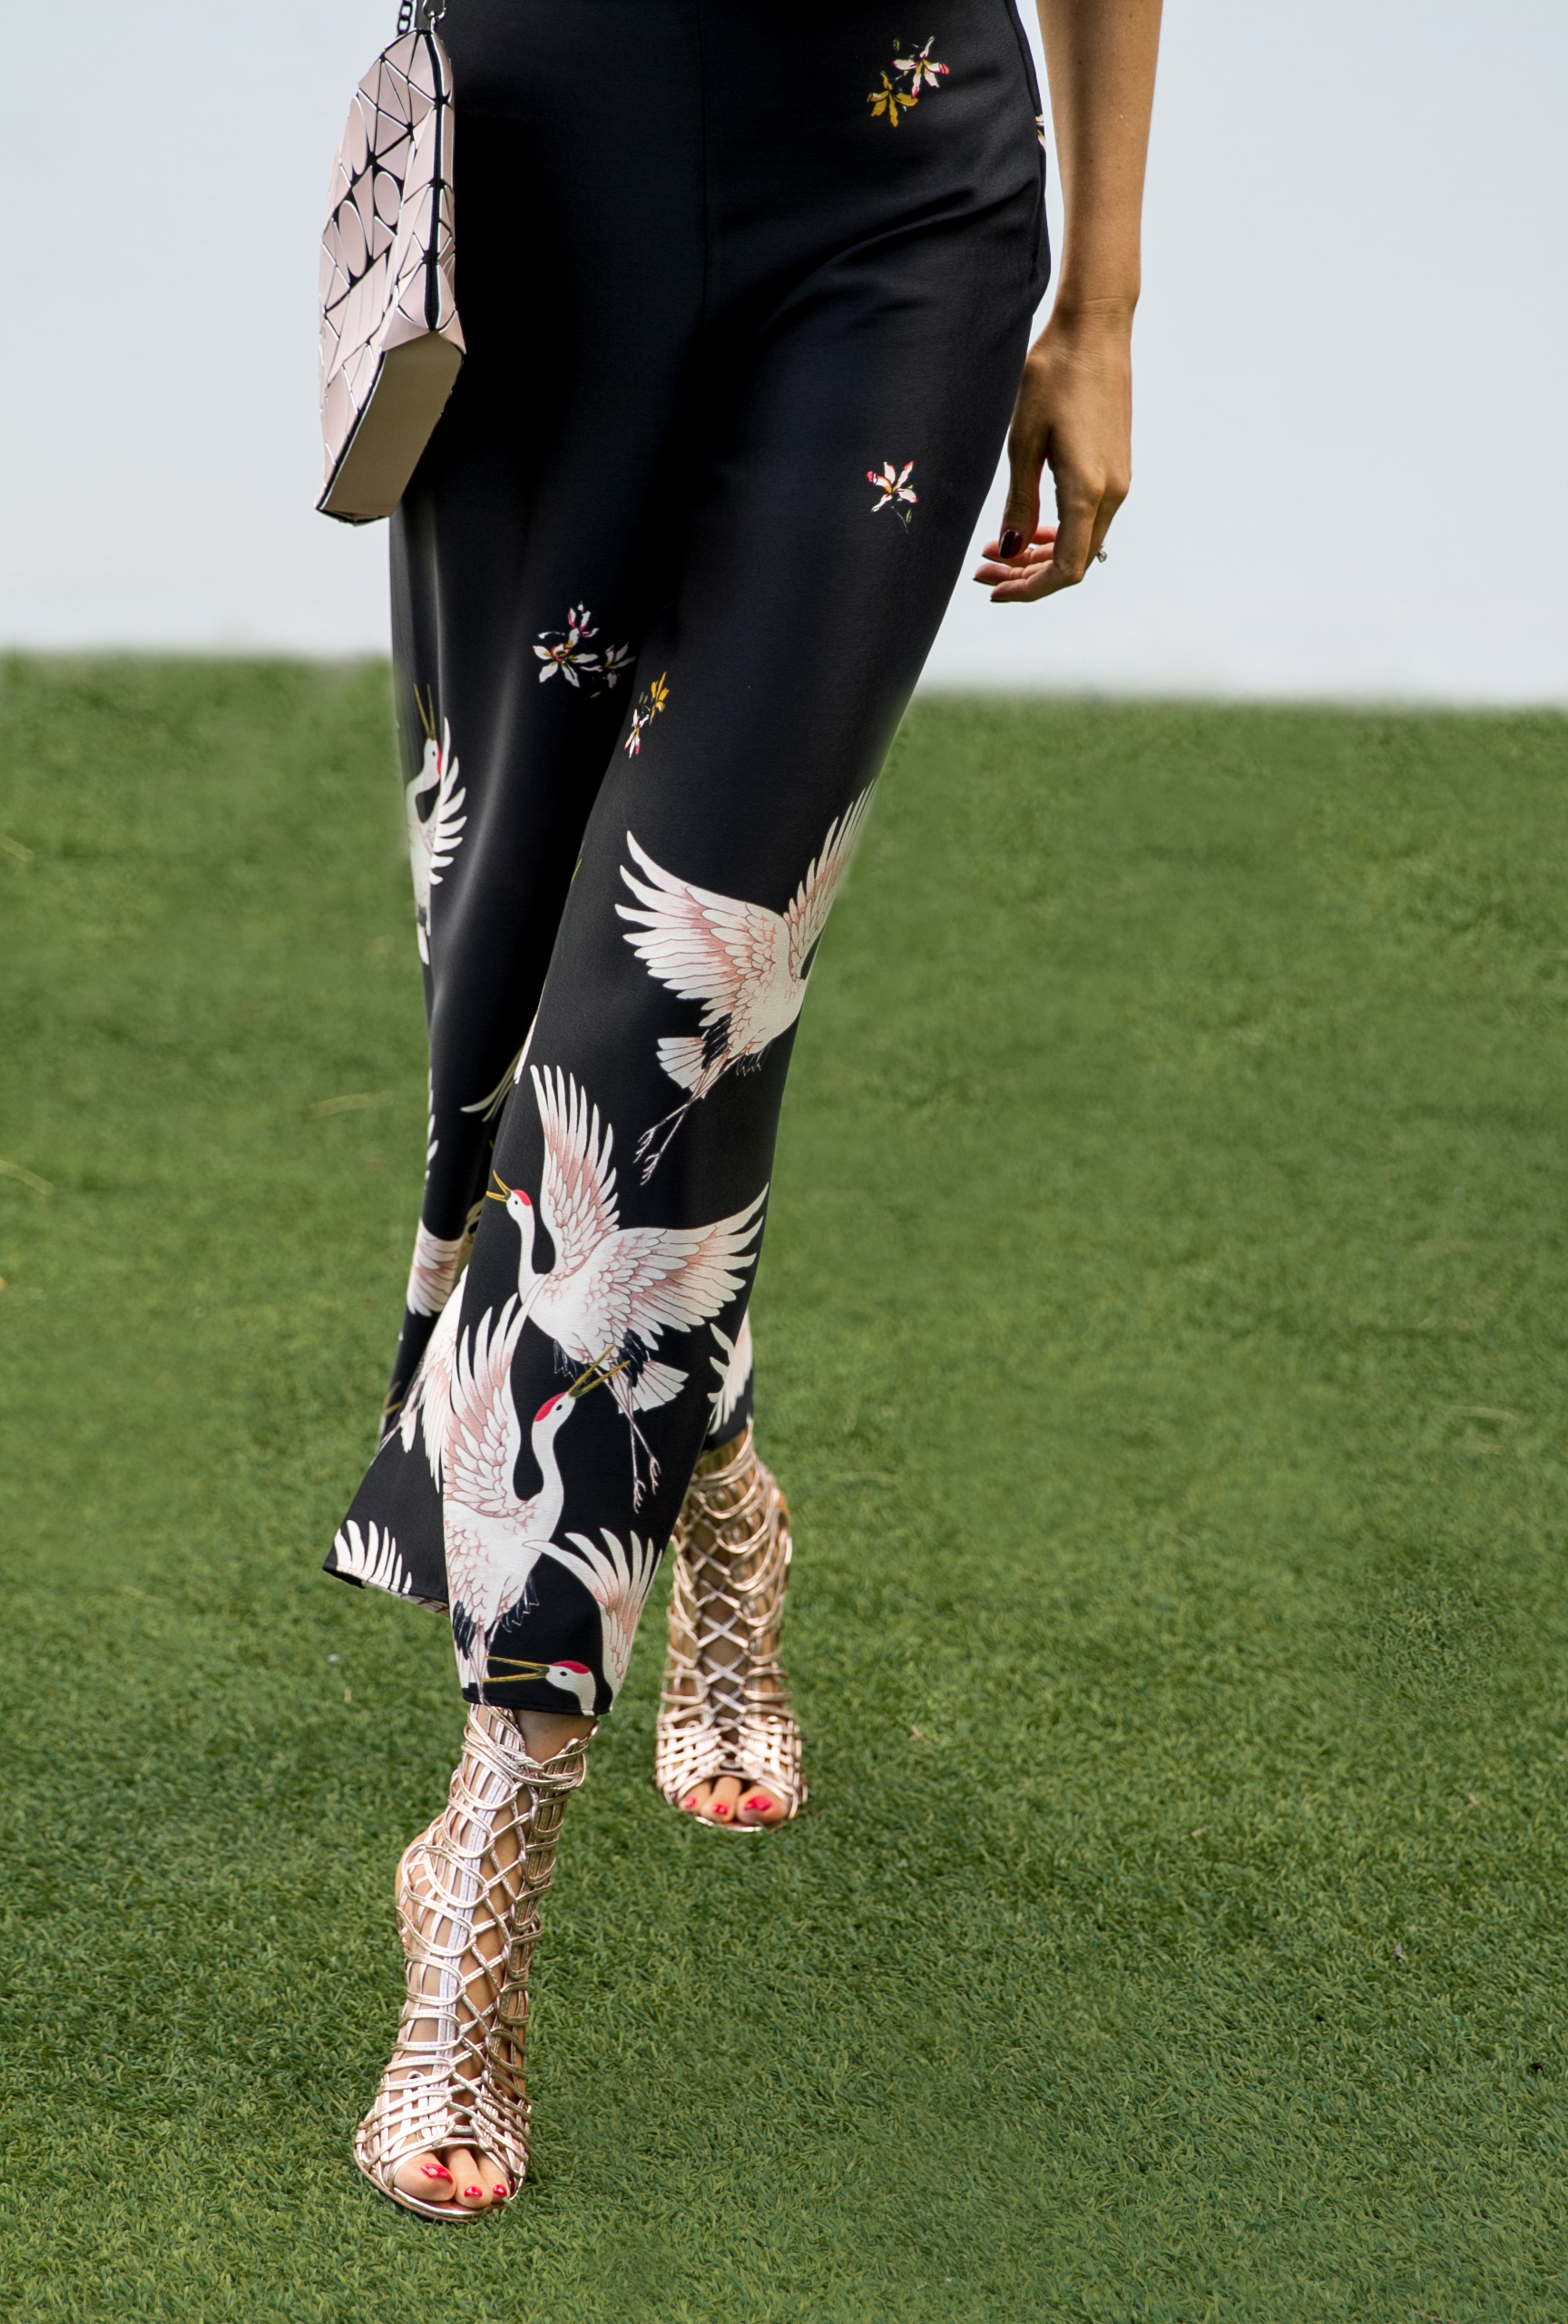 fd6c5159 Sophia Webster heels – The Dressed Fork